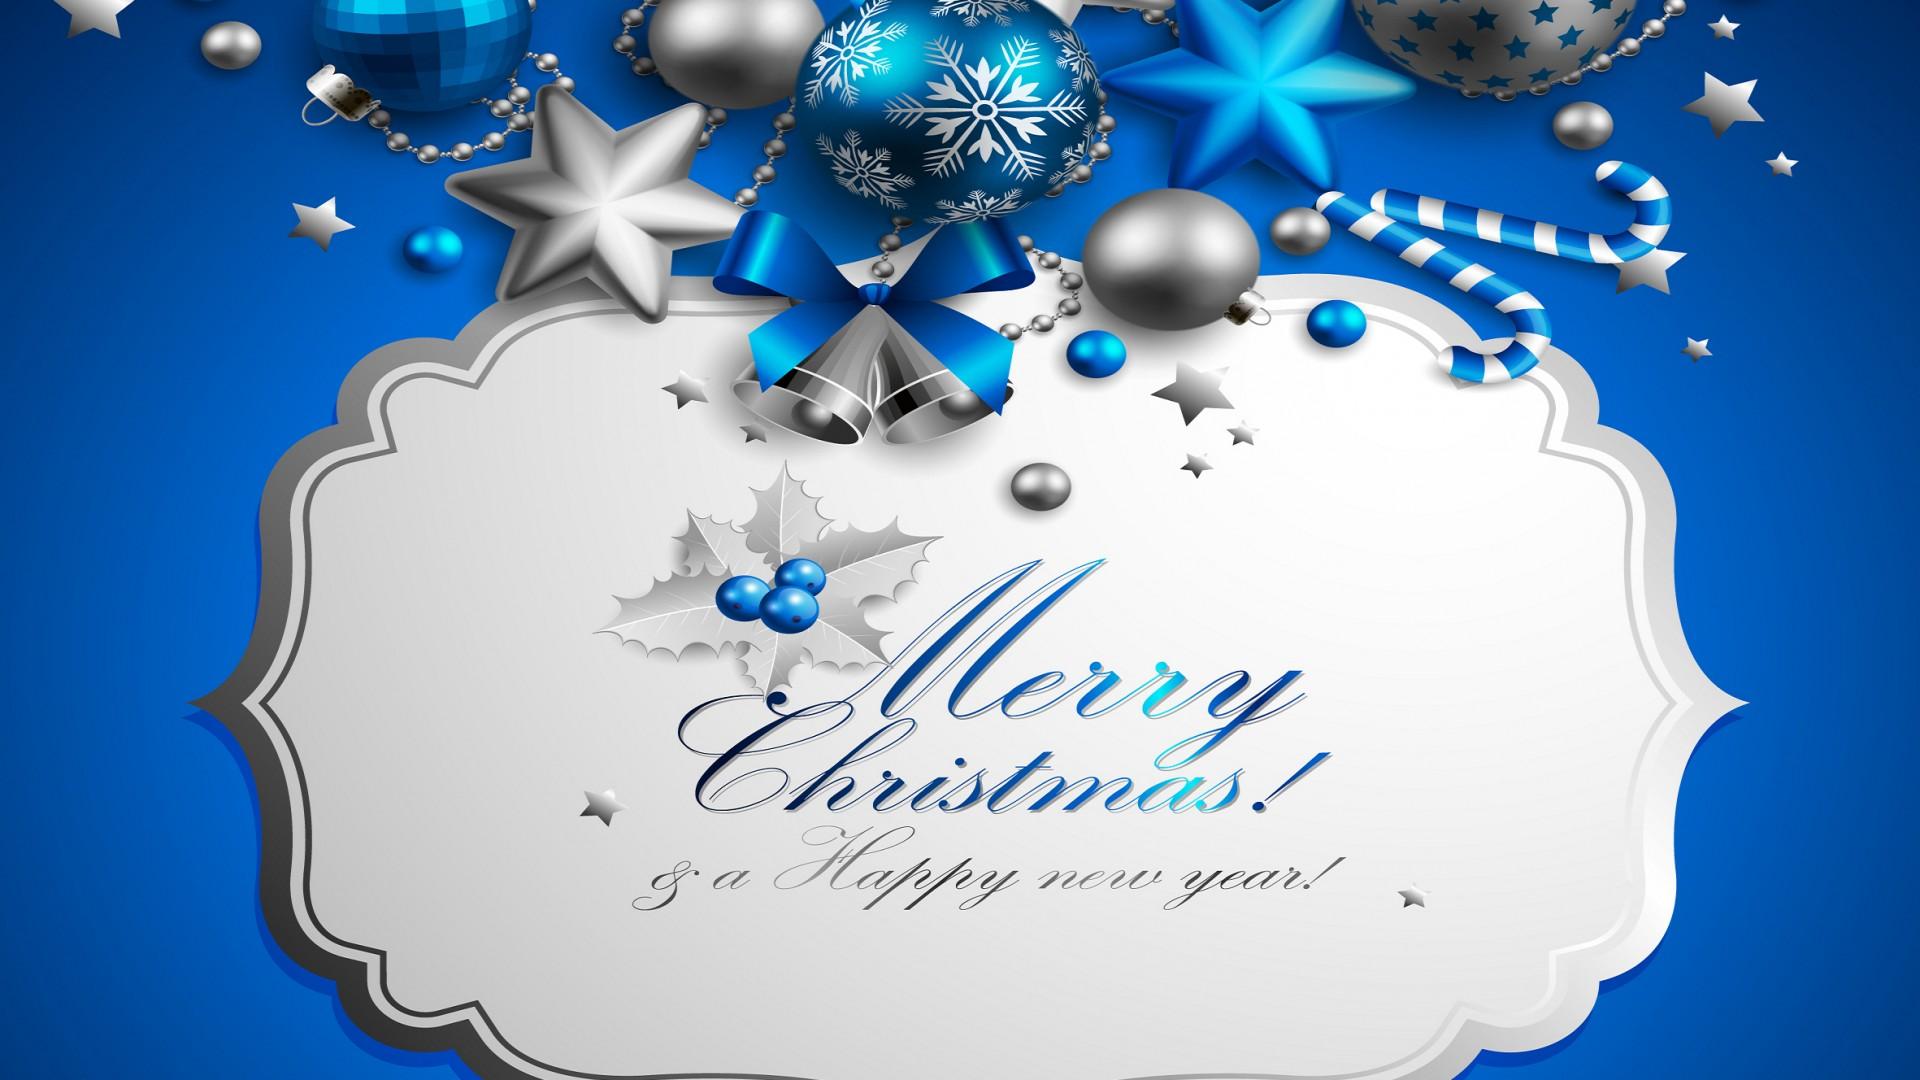 Merry christmas wallpapers free hd hd desktop wallpapers 4k hd kristyandbryce Gallery